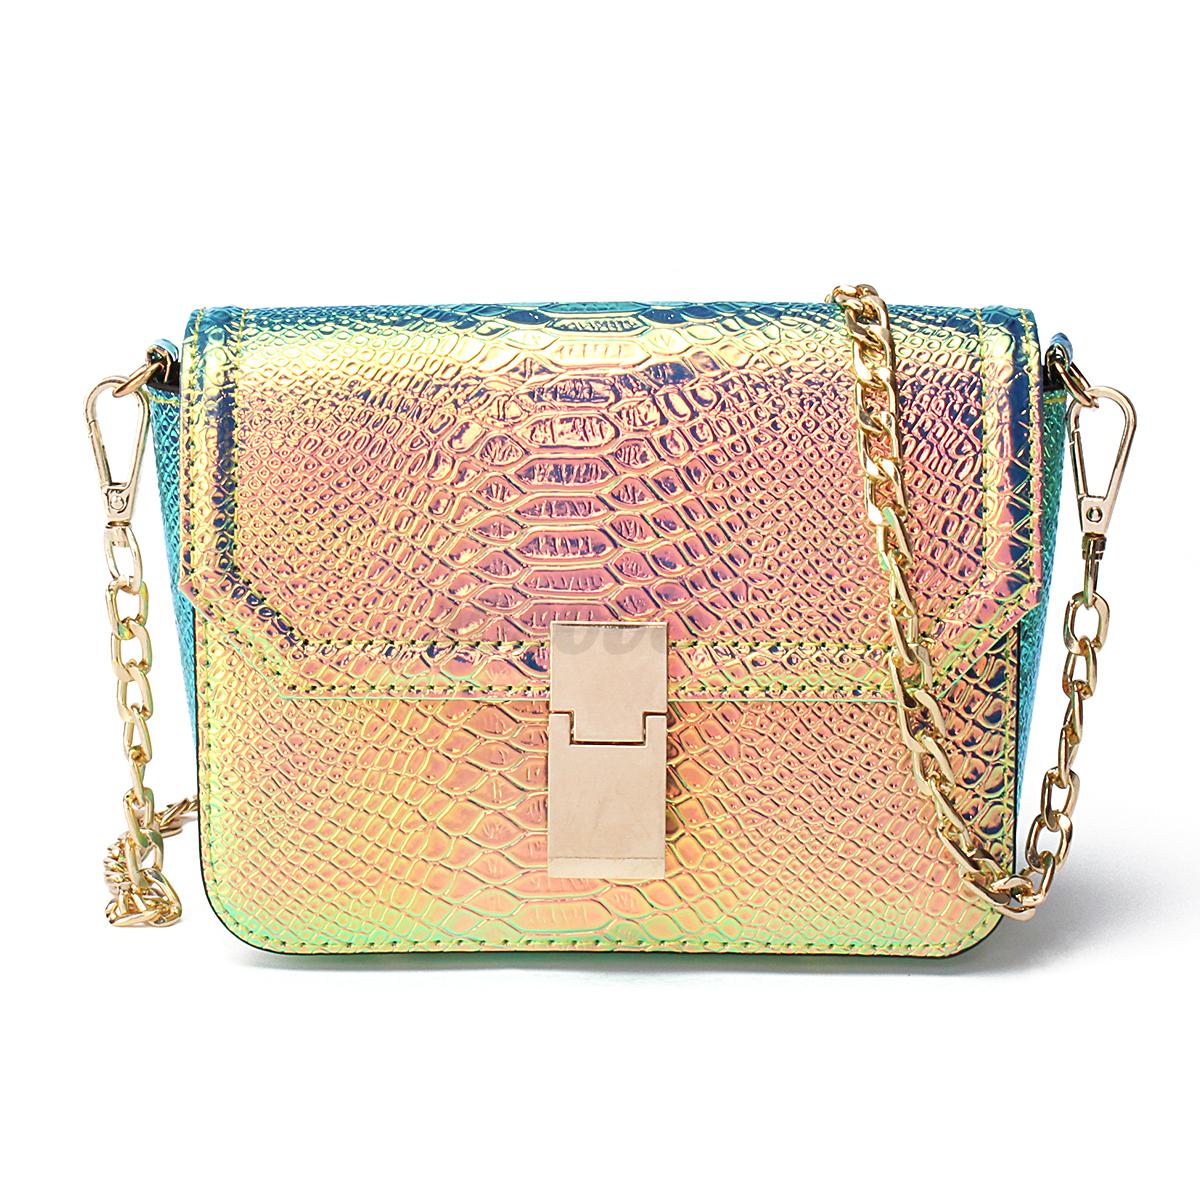 Fashion Women Holographic Laser Print PU Leather Purse Crossbody Shoulder Bag